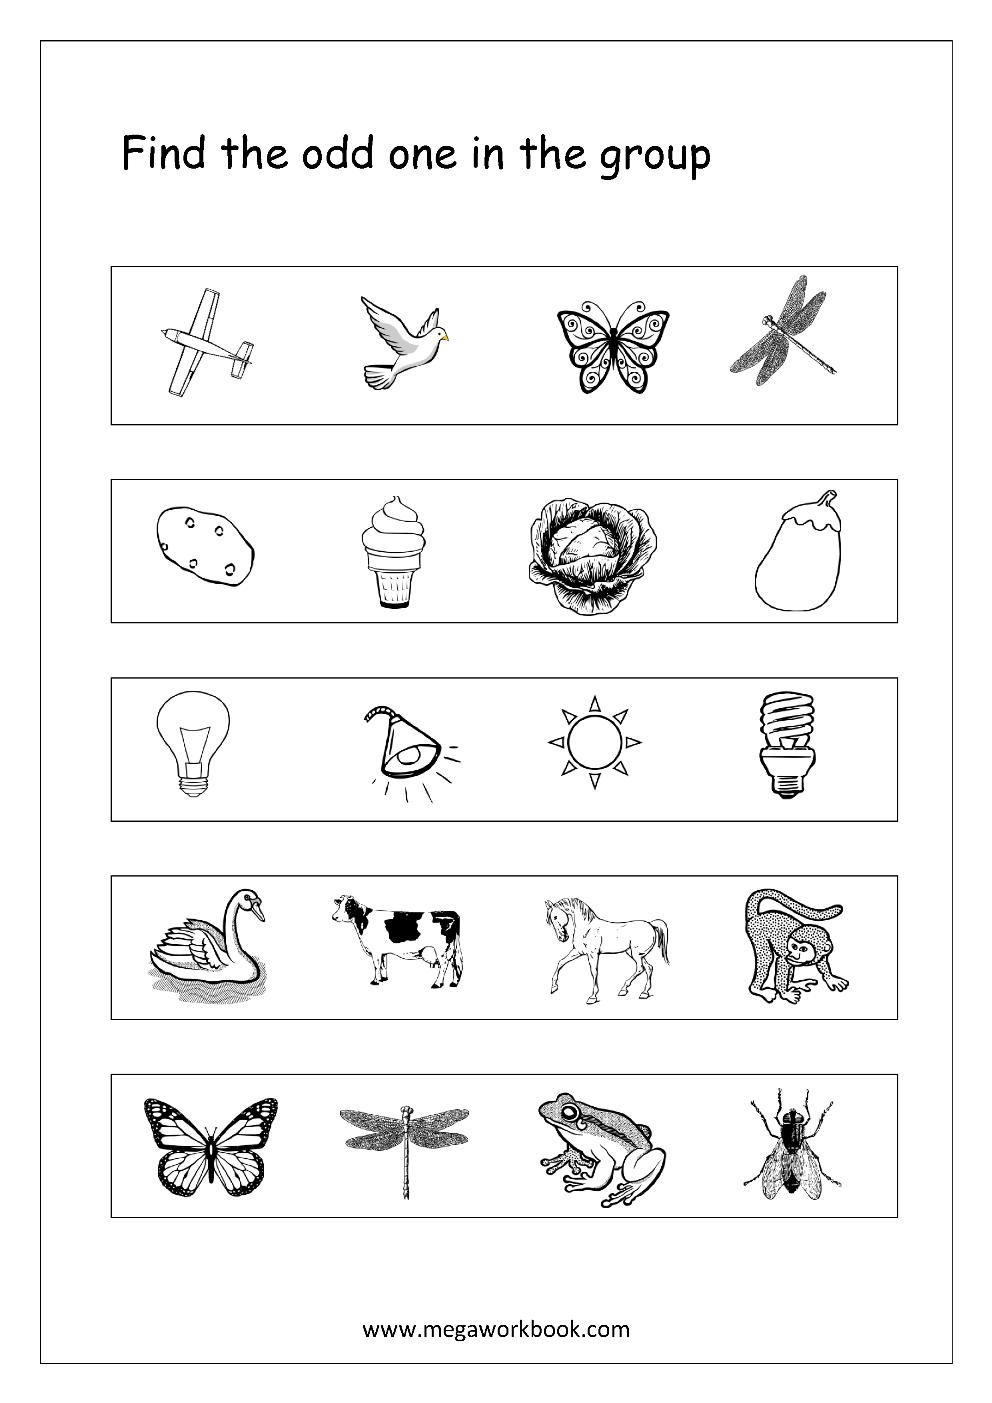 Odd One Out - Worksheet 3 | kognitív | Pinterest